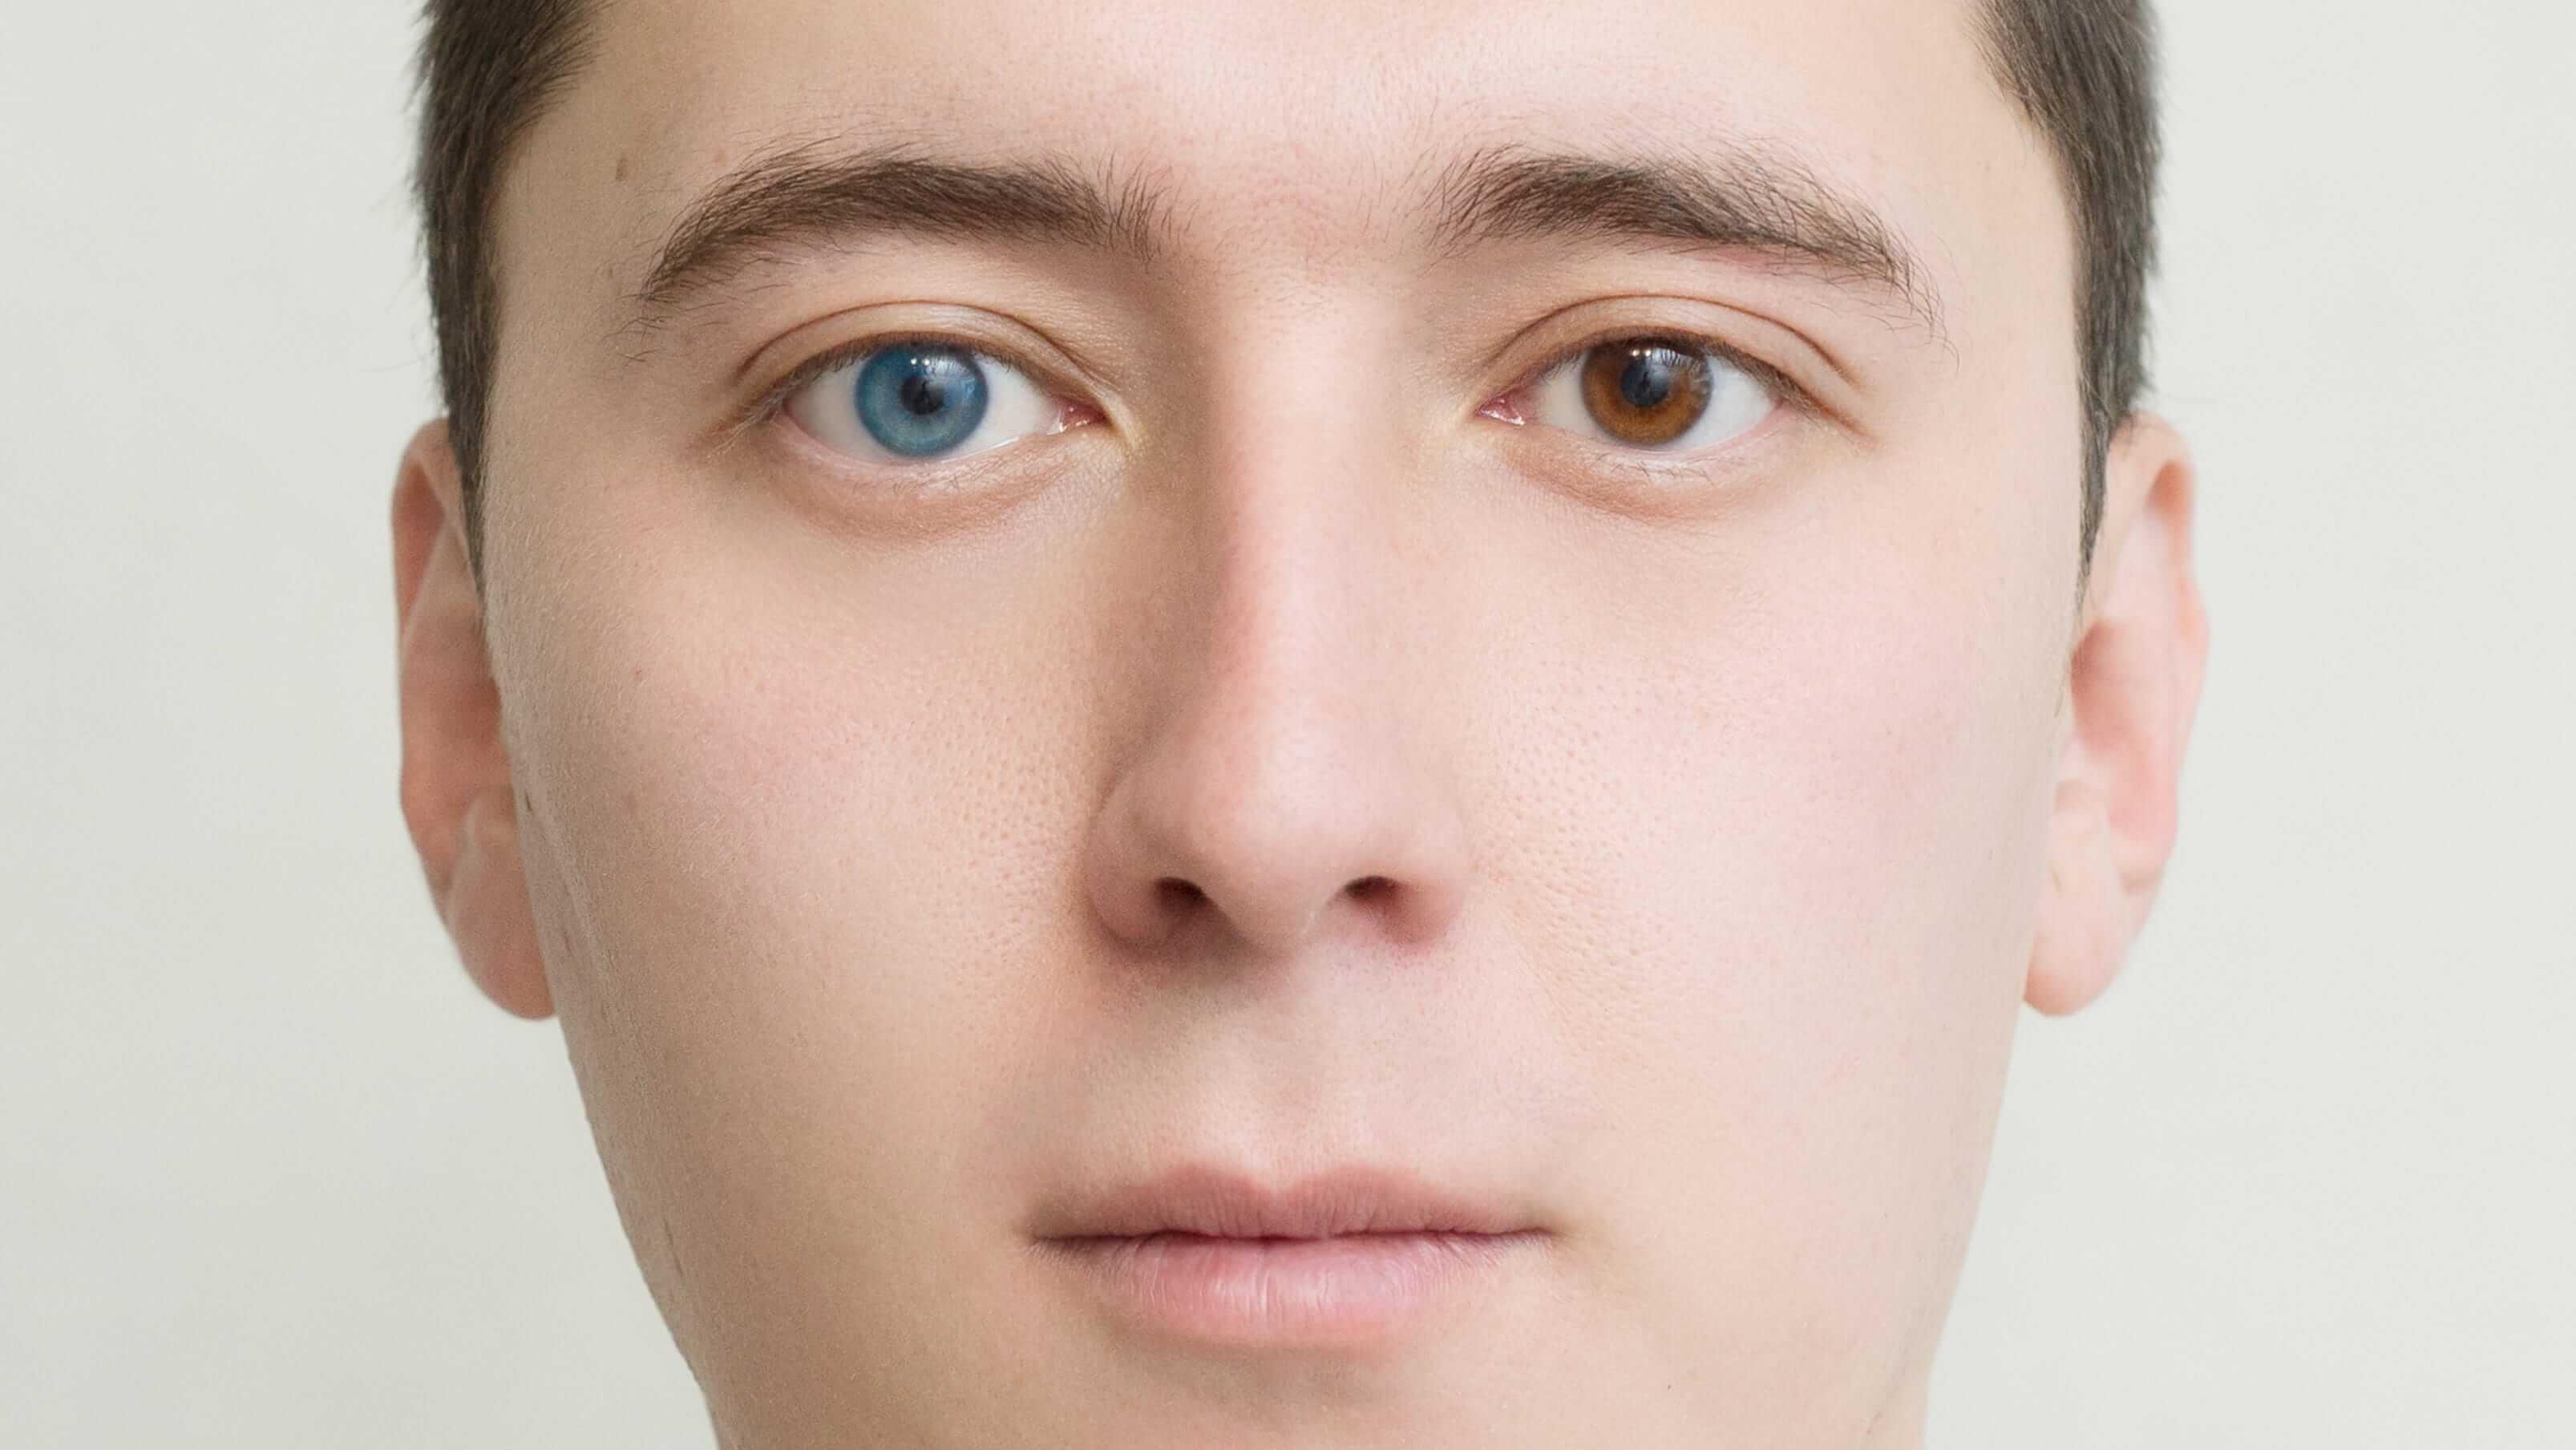 Heterochromia: Causes, Diagnosis and Treatment